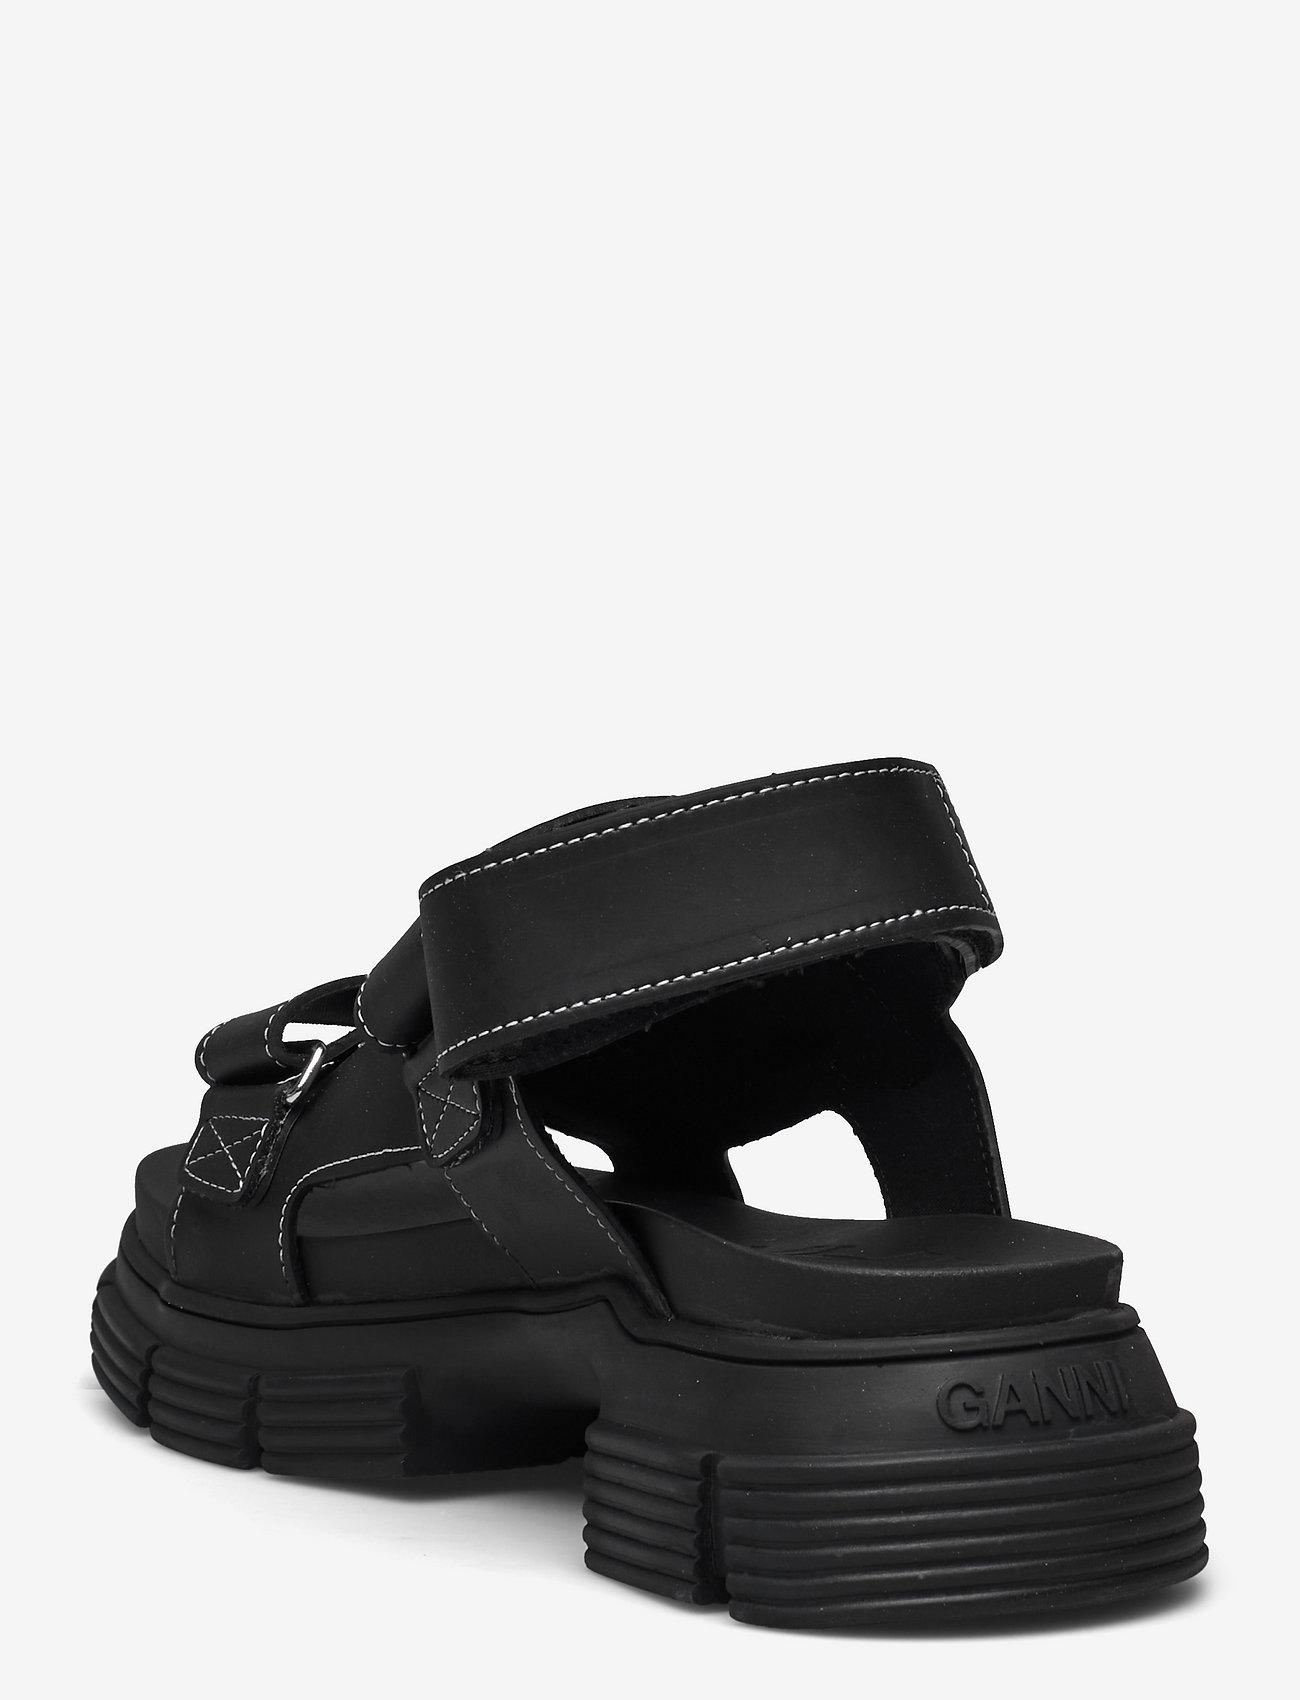 Ganni - Recycled Rubber - płaskie sandały - black - 2